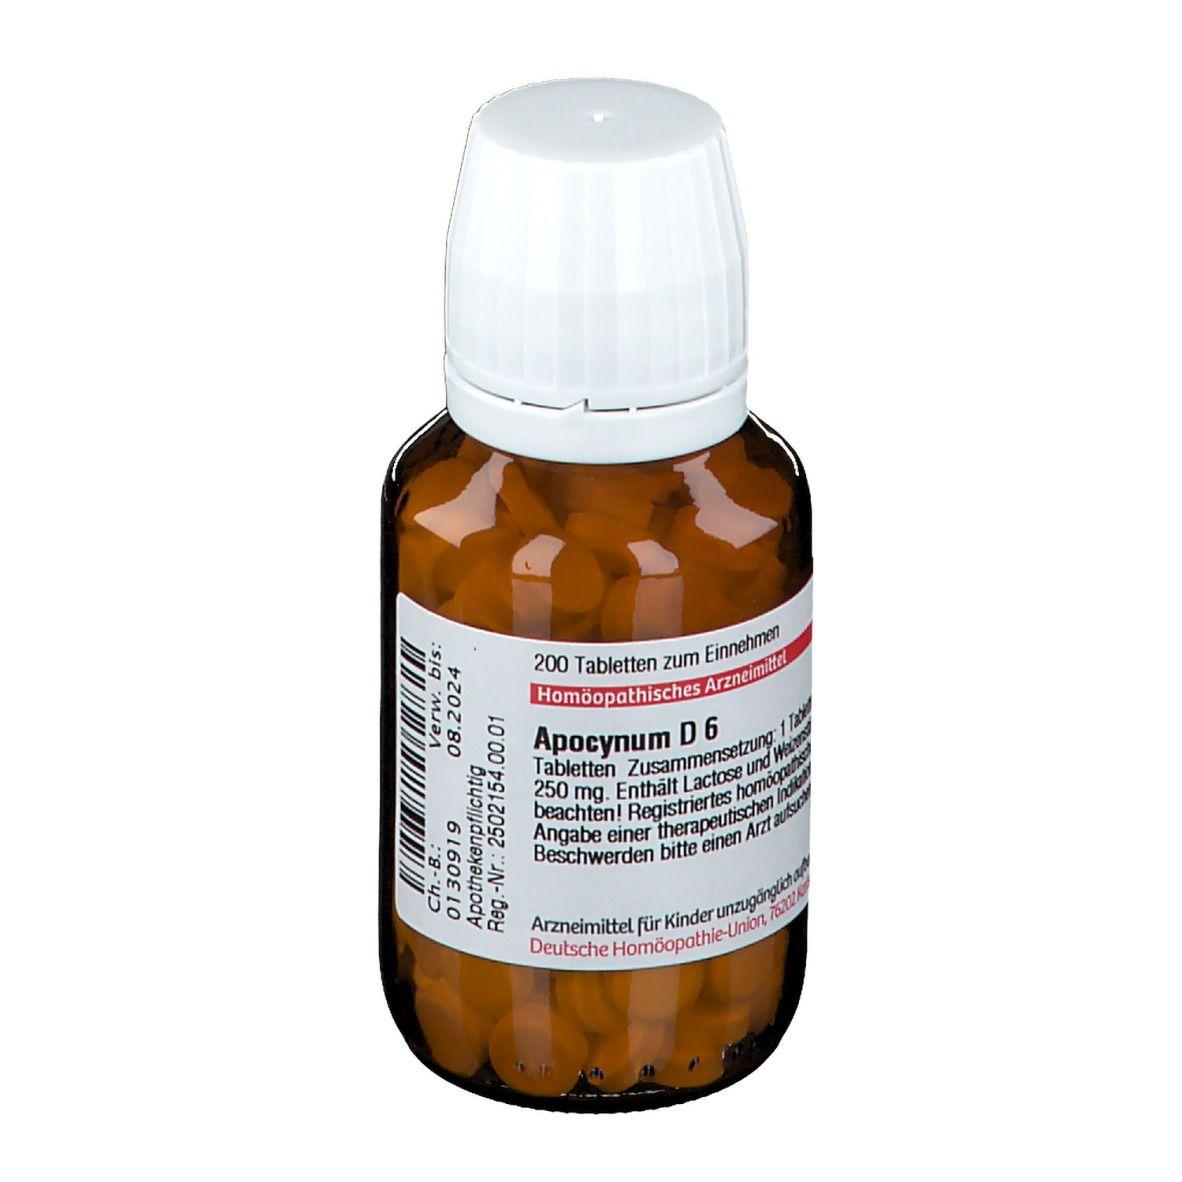 DHU Apocynum D6